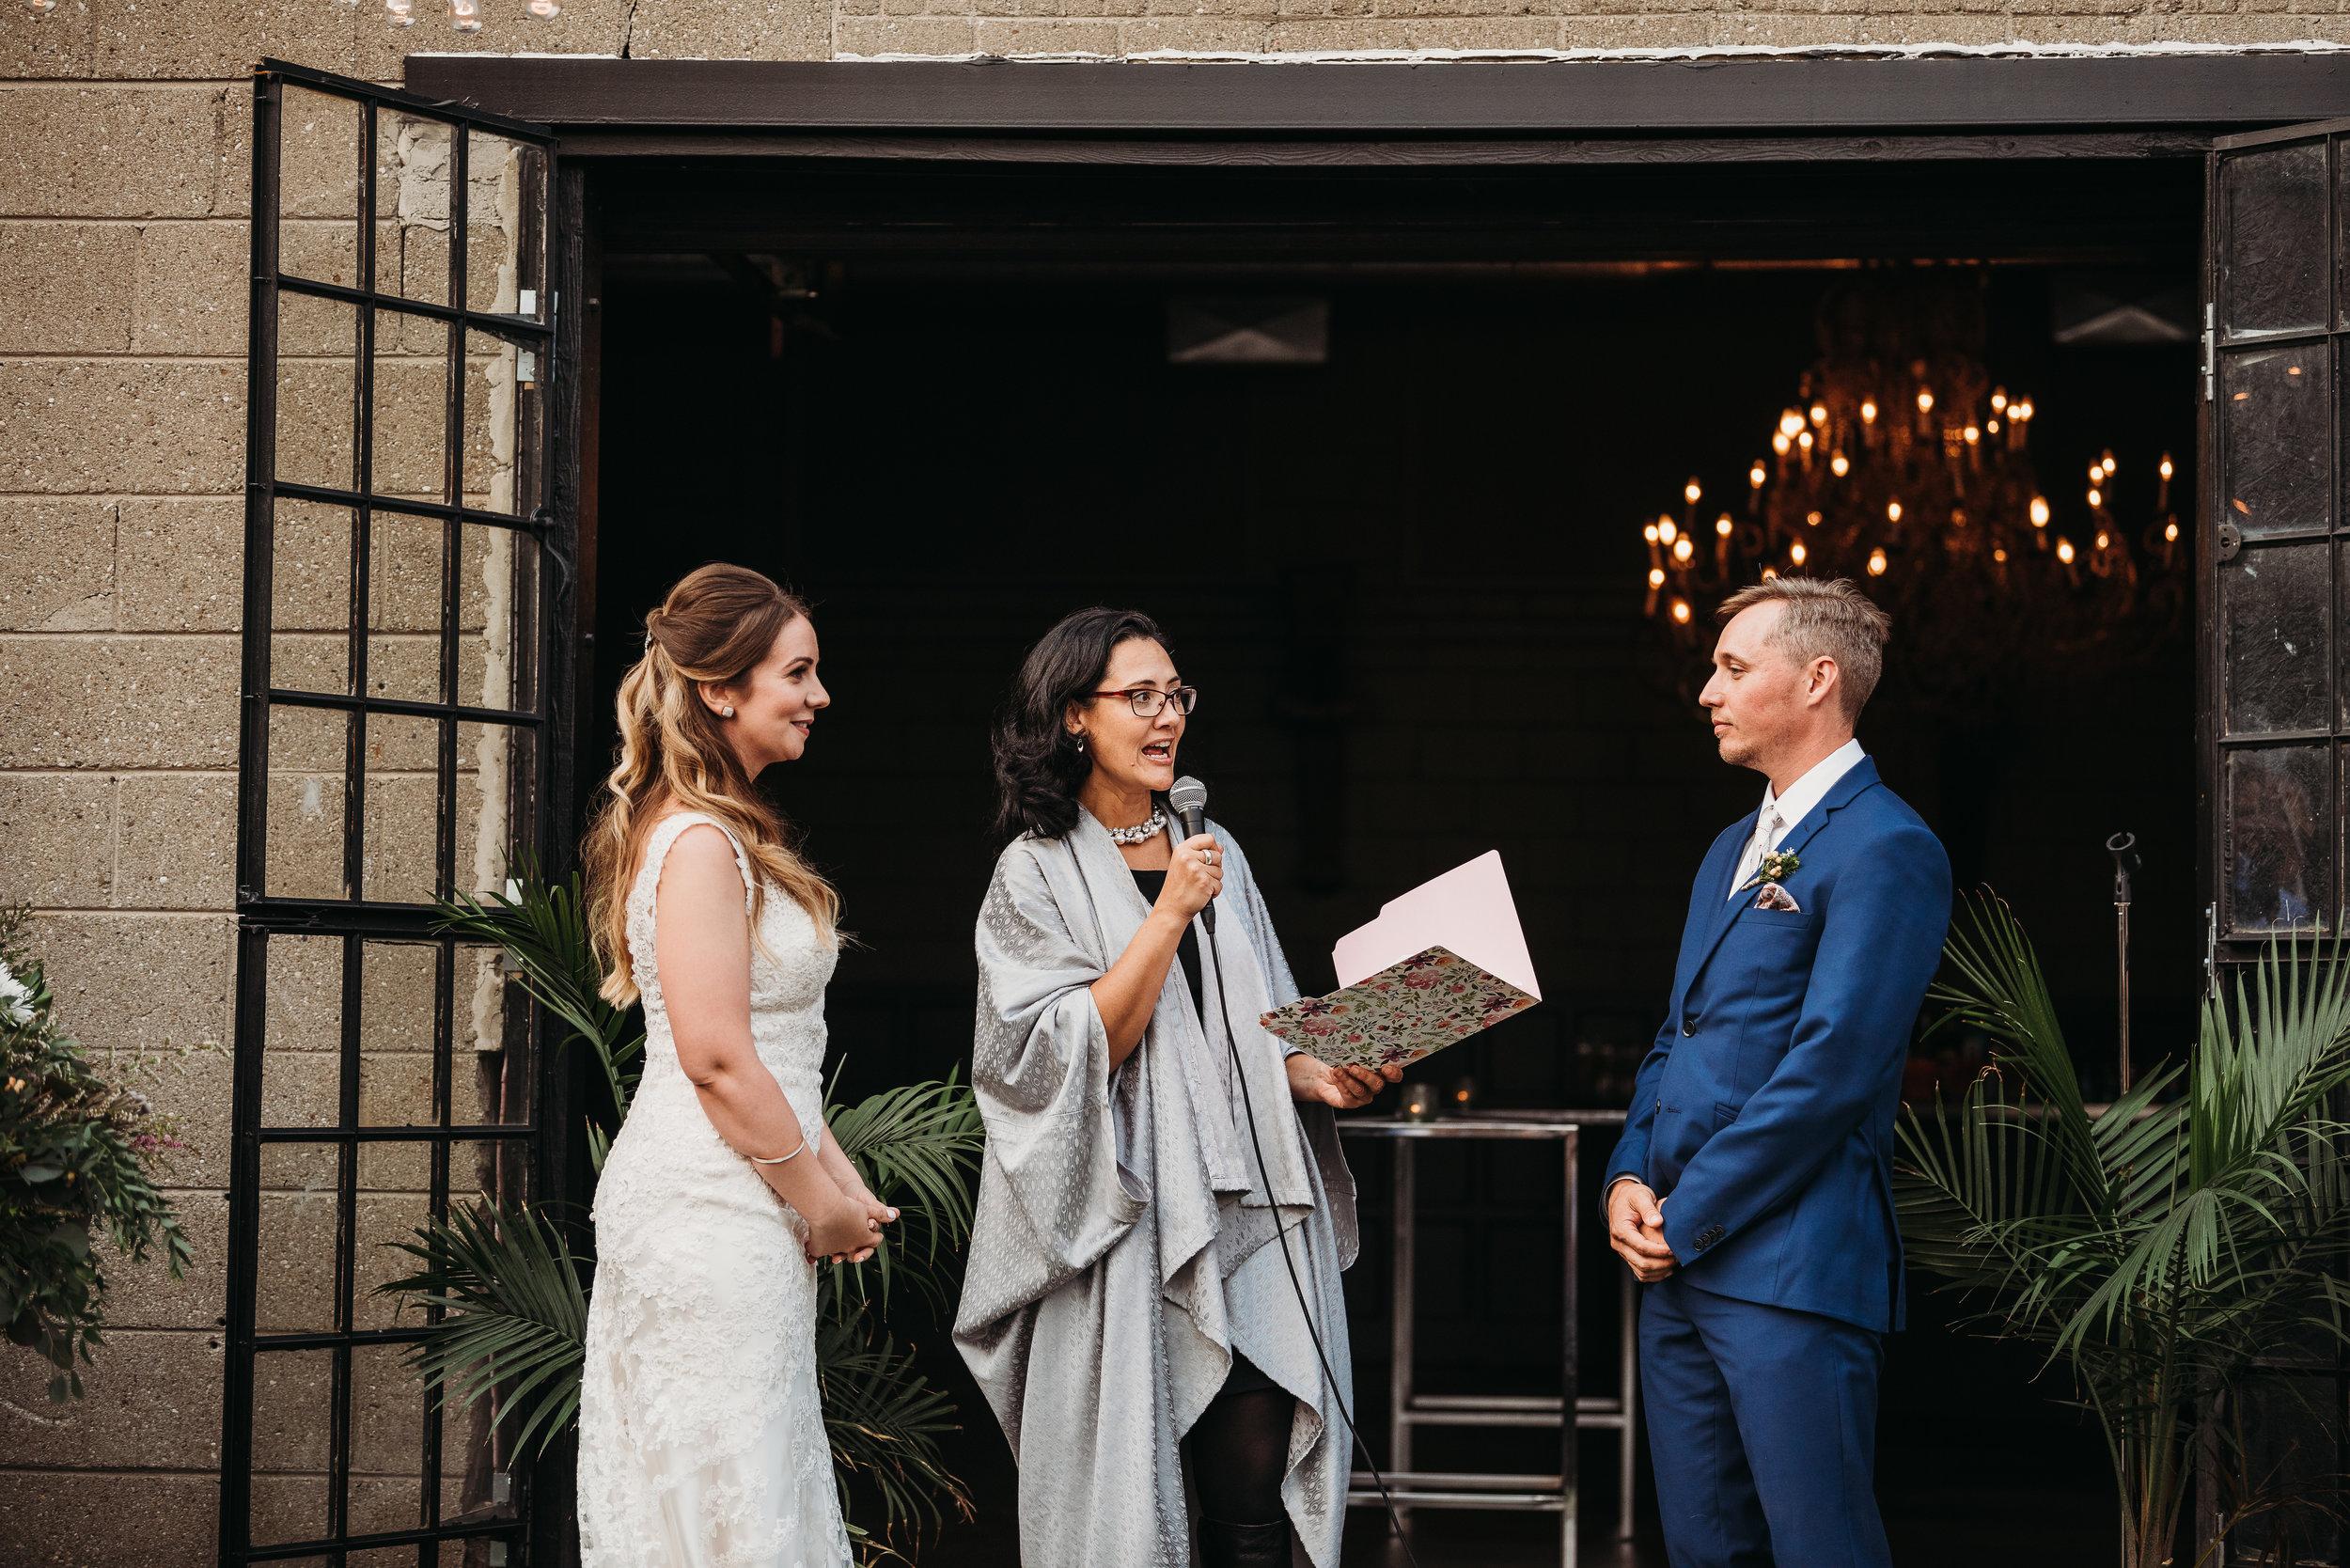 bride-groom-ceremony-toronto-rustic-boho-airship37-wedding-by-willow-birch-photo-toronto-documentary-wedding-photographers.jpg